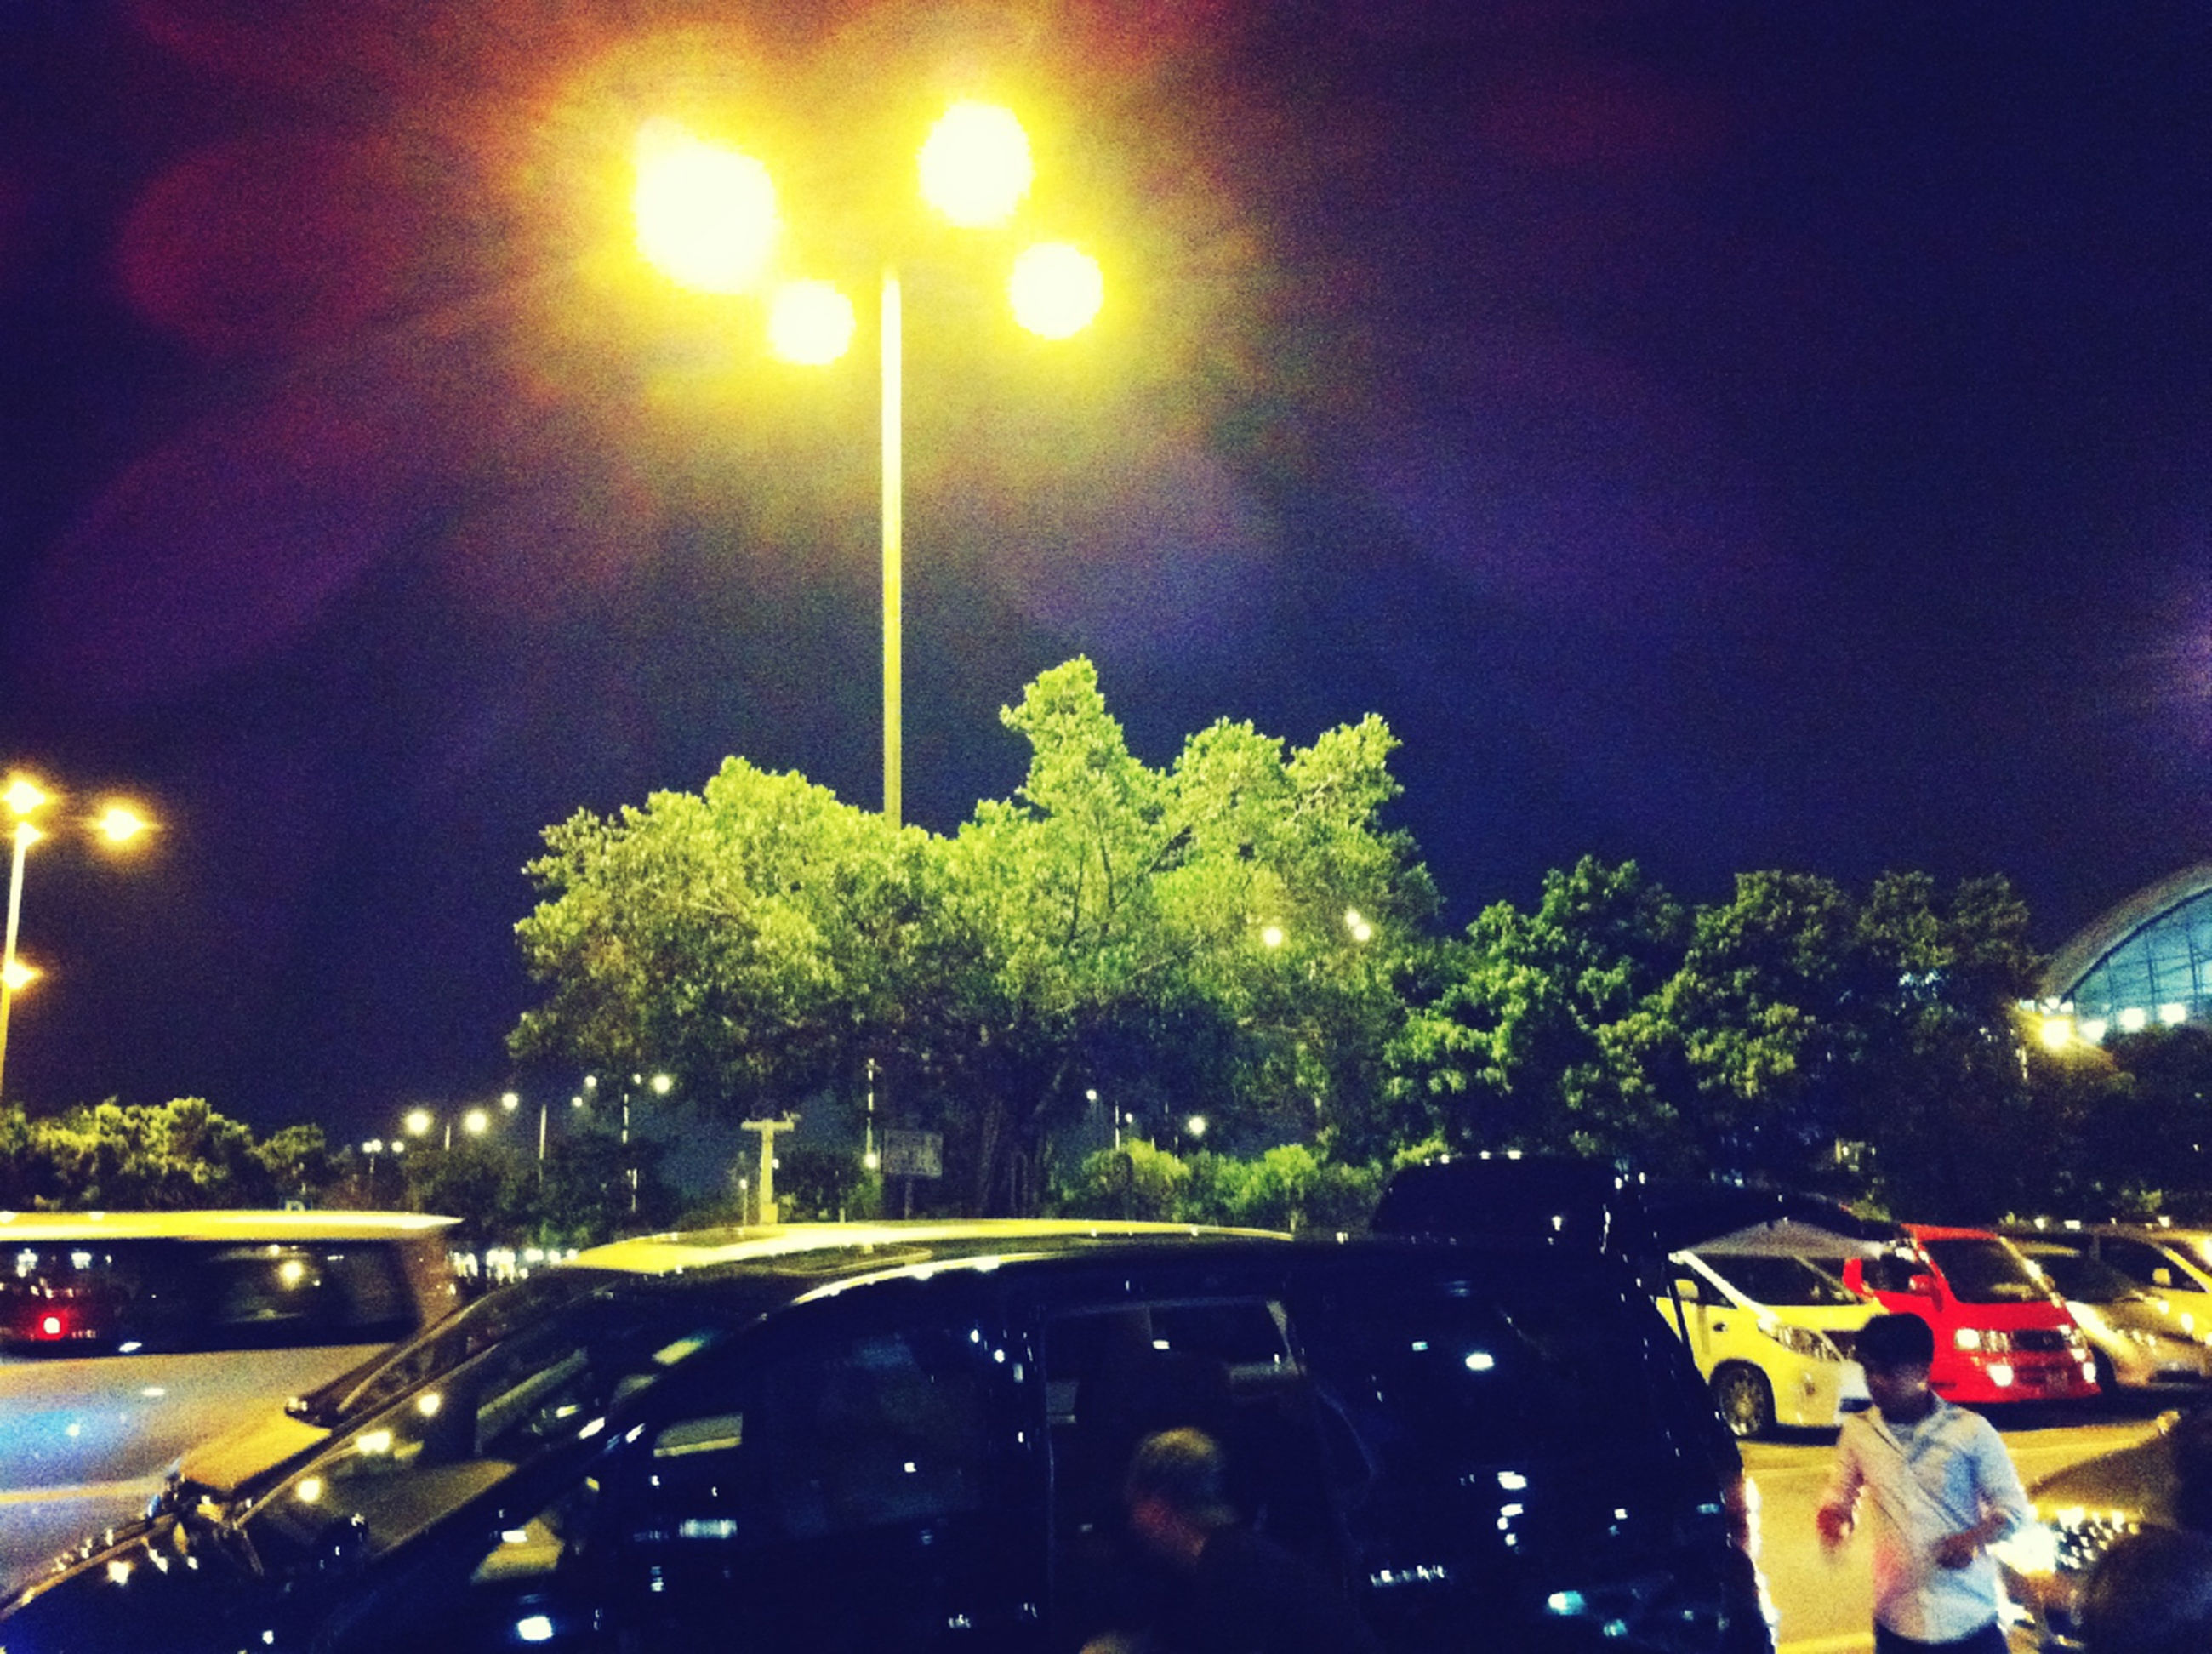 illuminated, night, street light, transportation, lighting equipment, land vehicle, mode of transport, car, tree, street, road, men, incidental people, sky, light - natural phenomenon, lens flare, lifestyles, outdoors, glowing